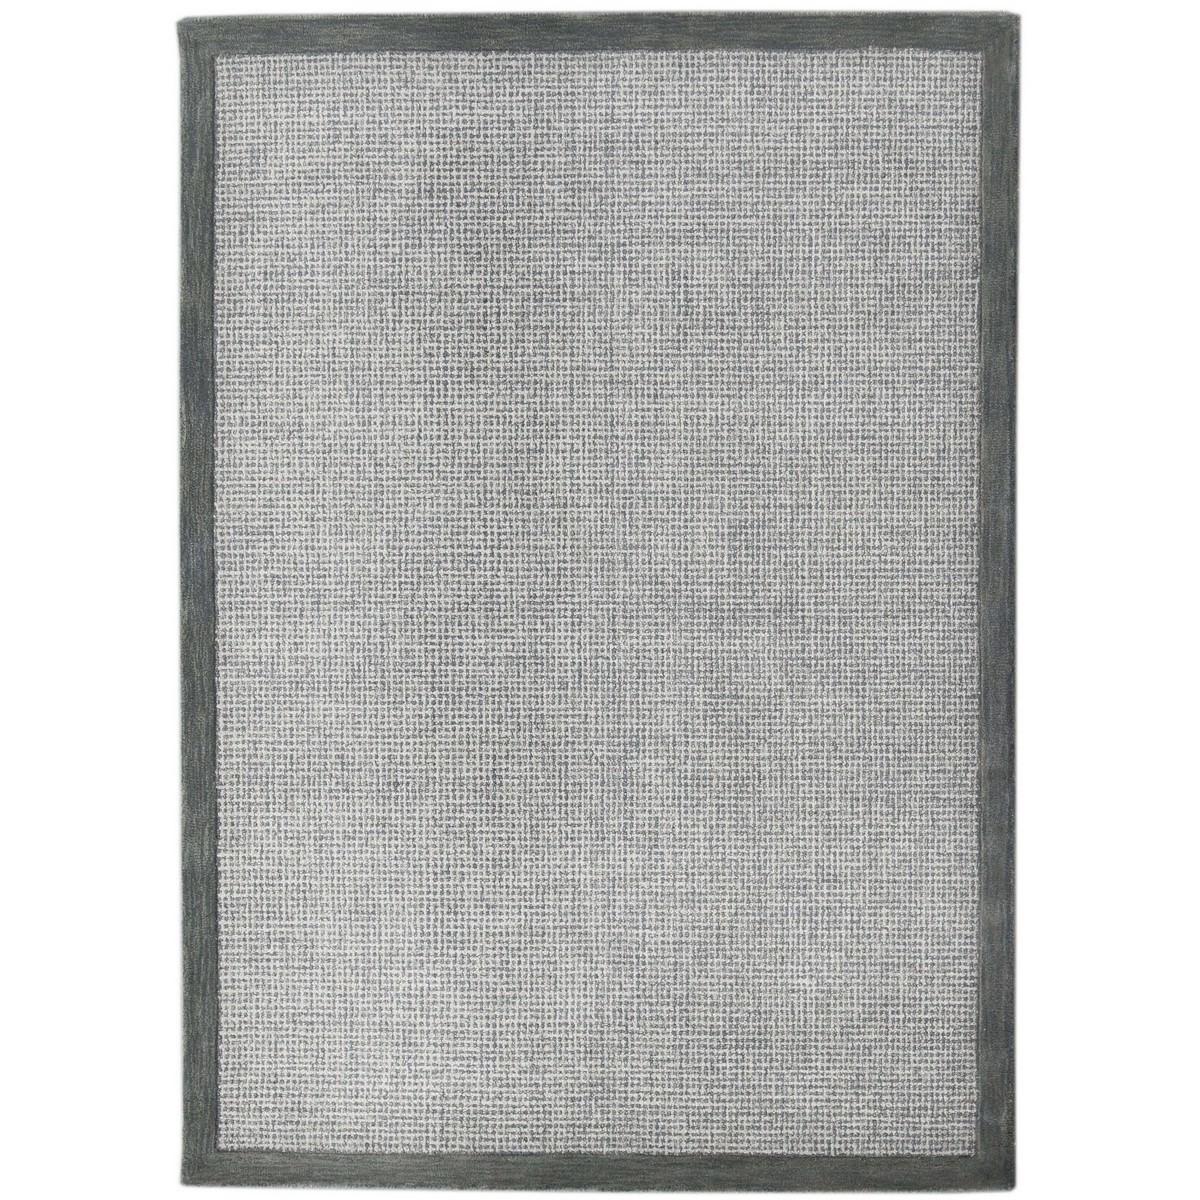 Idina Hand Tuffted Wool Rug, 160x230cm, Slate